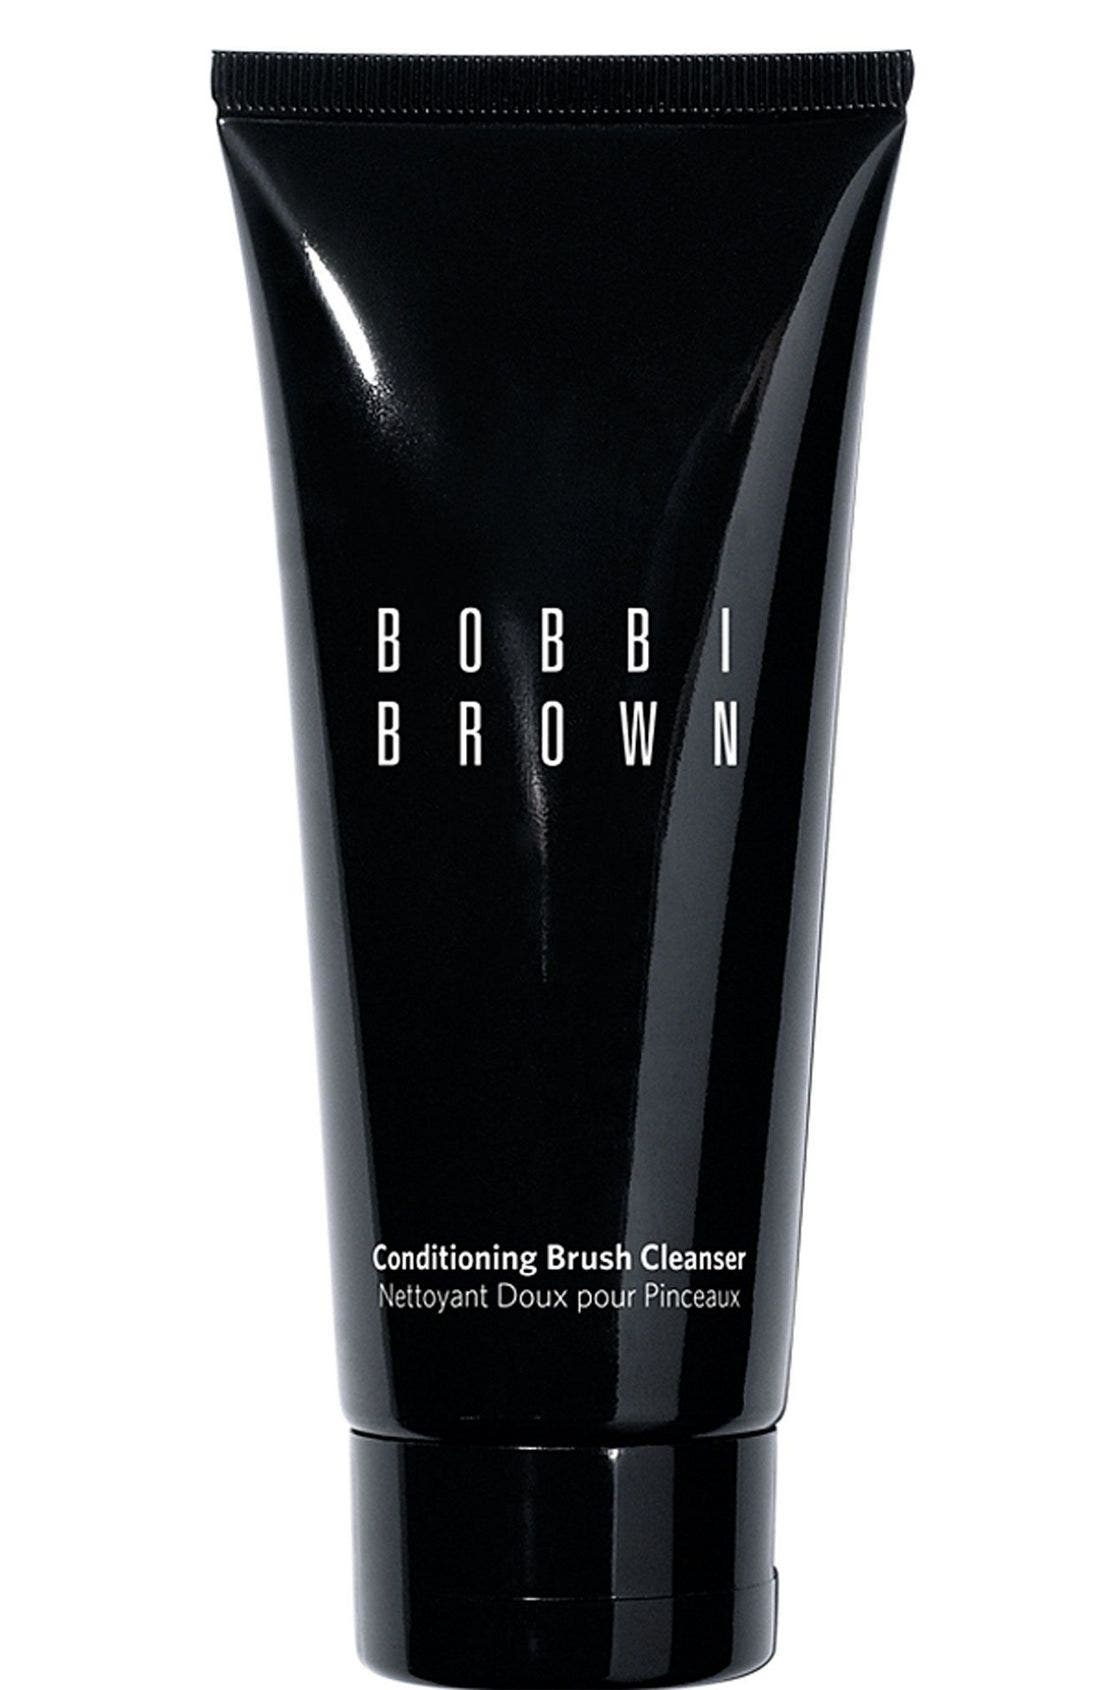 Bobbi Brown Brush Cleanser